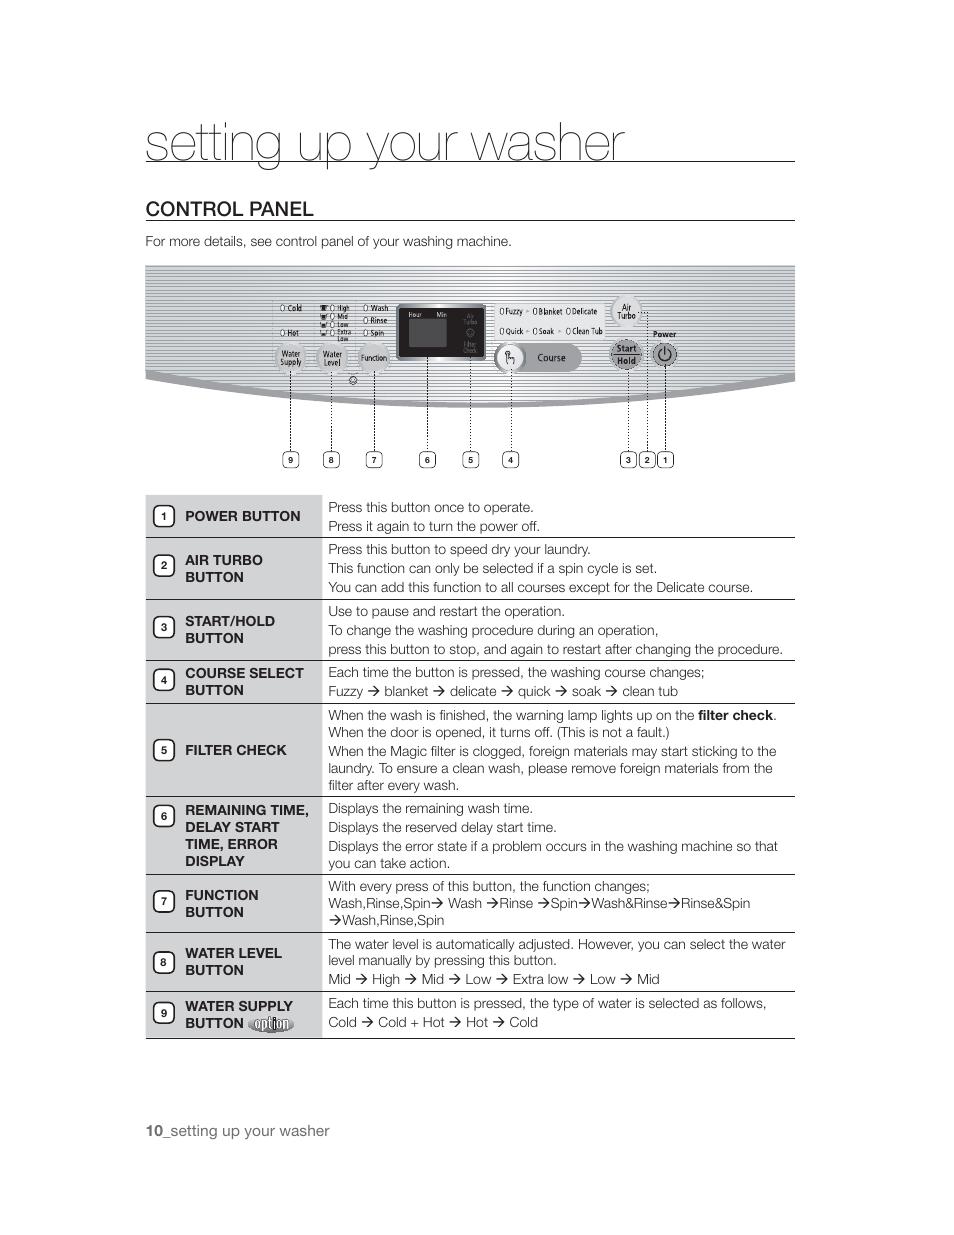 rotting up your warhnr control panel samsung wa85u3 user manual rh manualsdir com  samsung wa80u3 repair manual